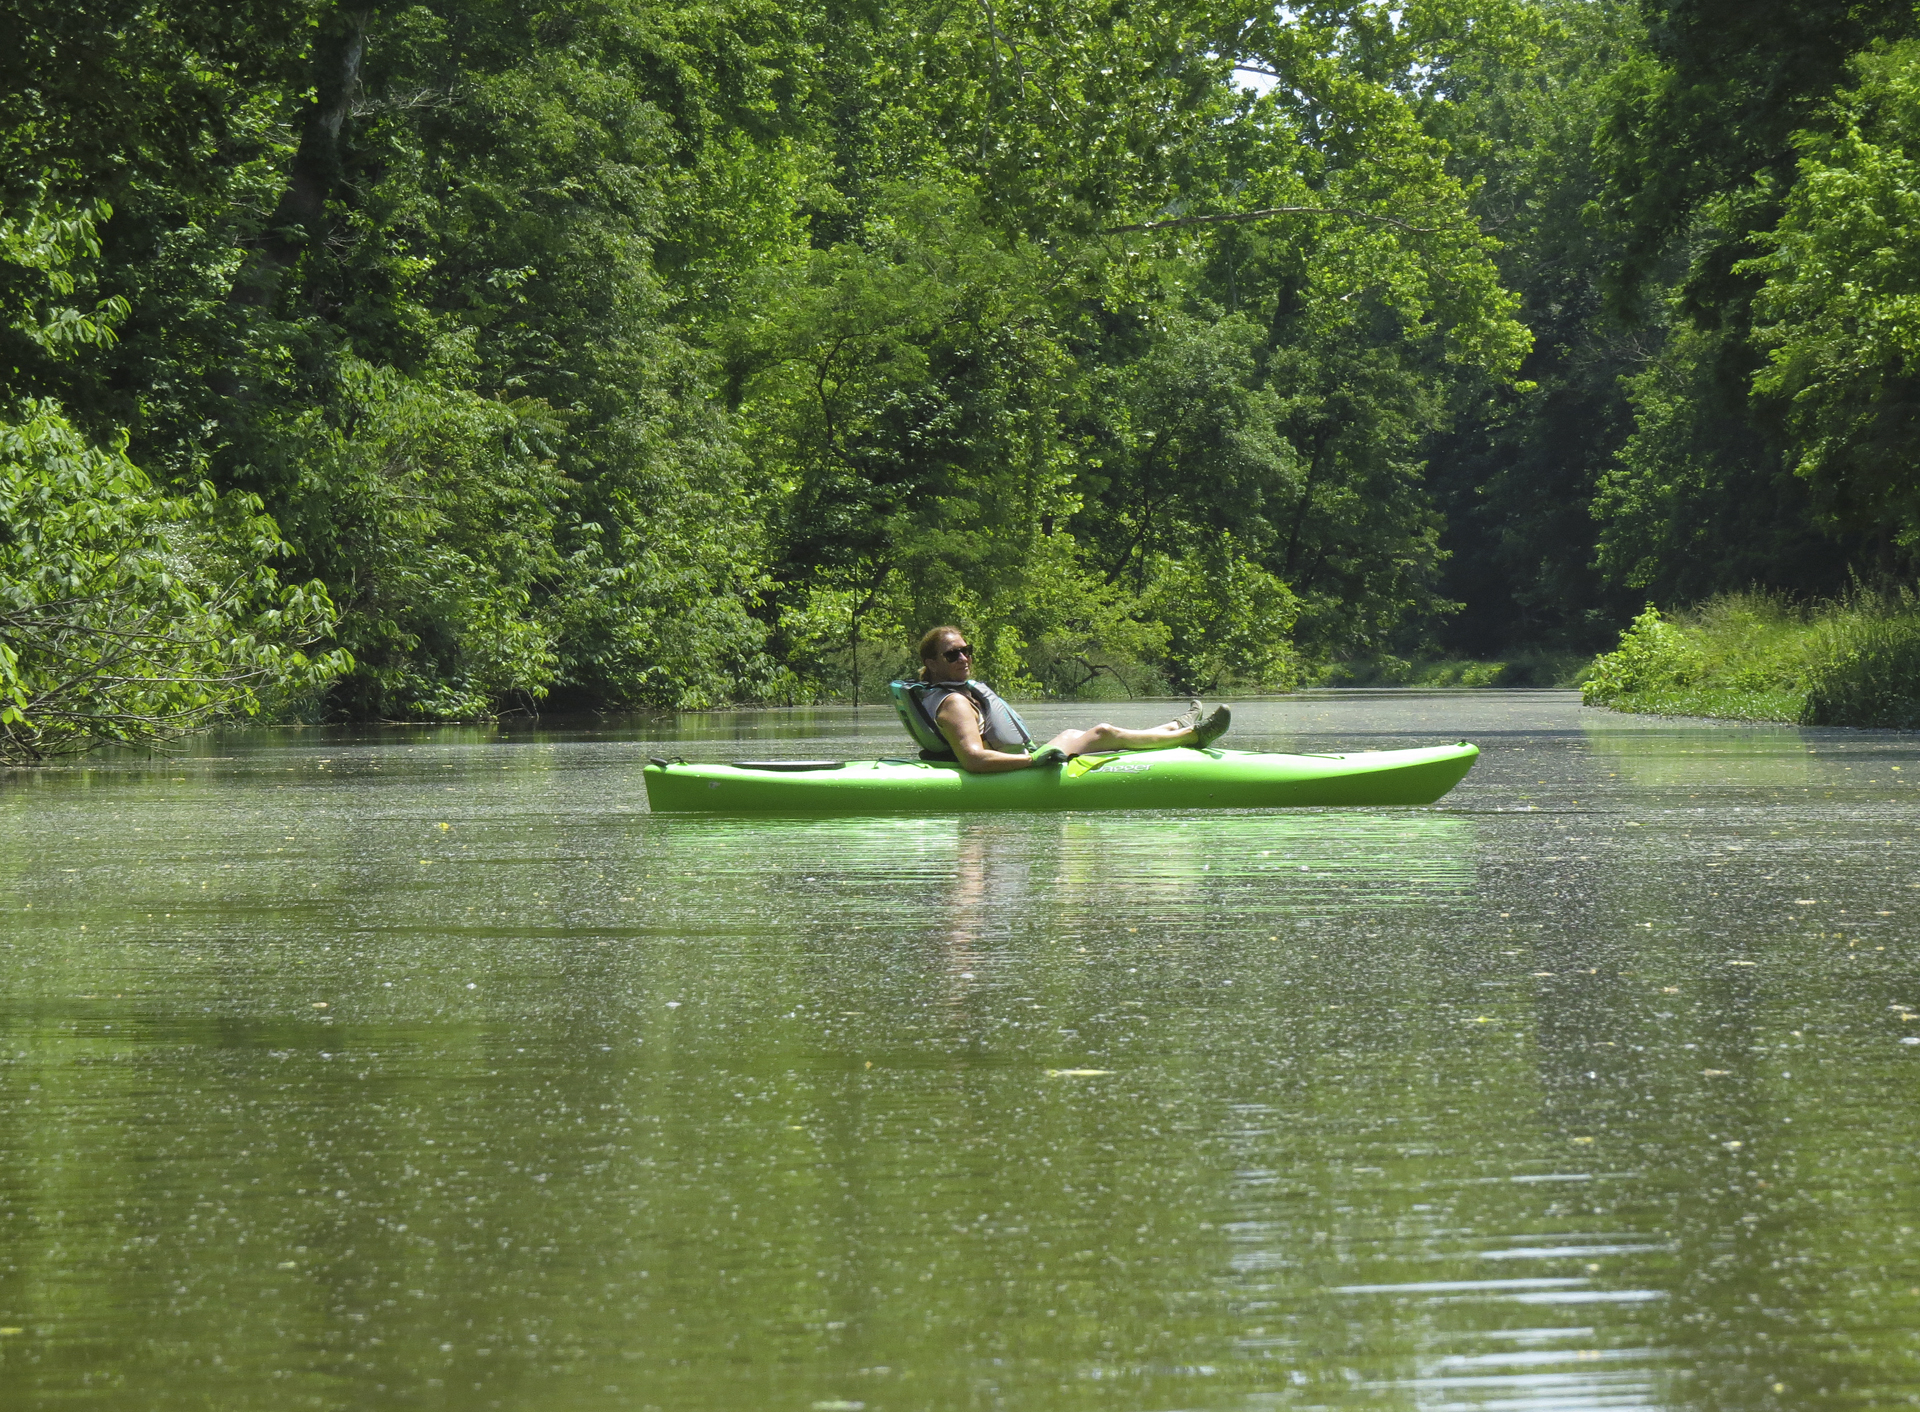 kayaking-women-outdoors-adventure-sports-kayaking-maryland-water-nature-outdoors-c&o-canal-potomac-river